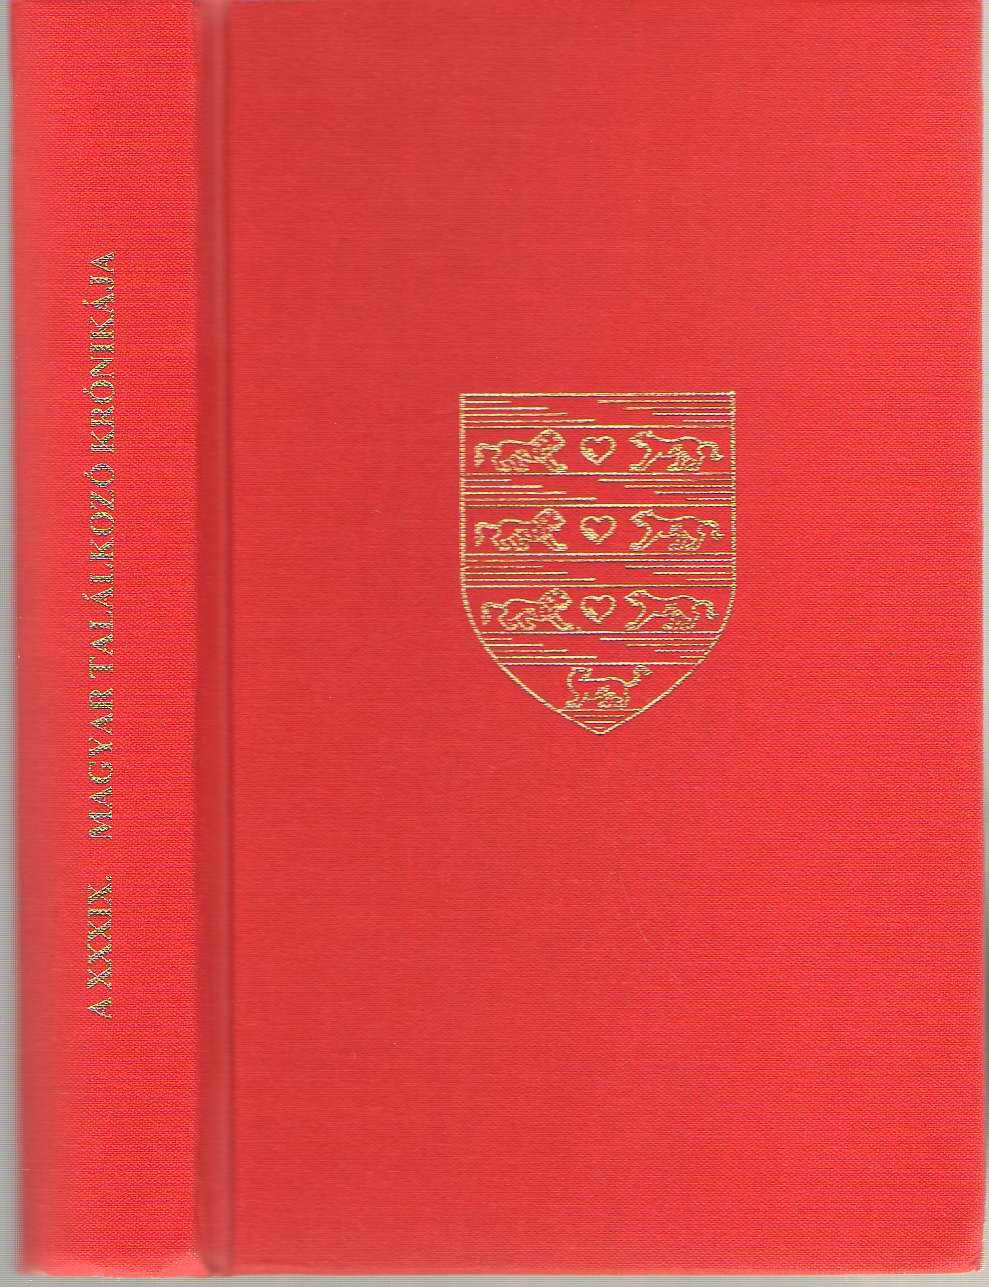 A Xxxix. Magyar Talalkozo Kronikaja Az Arpad Akademia Xxxiv. Evkonyve (proceedings Of The Xxxixth Annual Of Hungarian Scientific, Literary, And Artistic Association, Nadas, Gyula (editor)